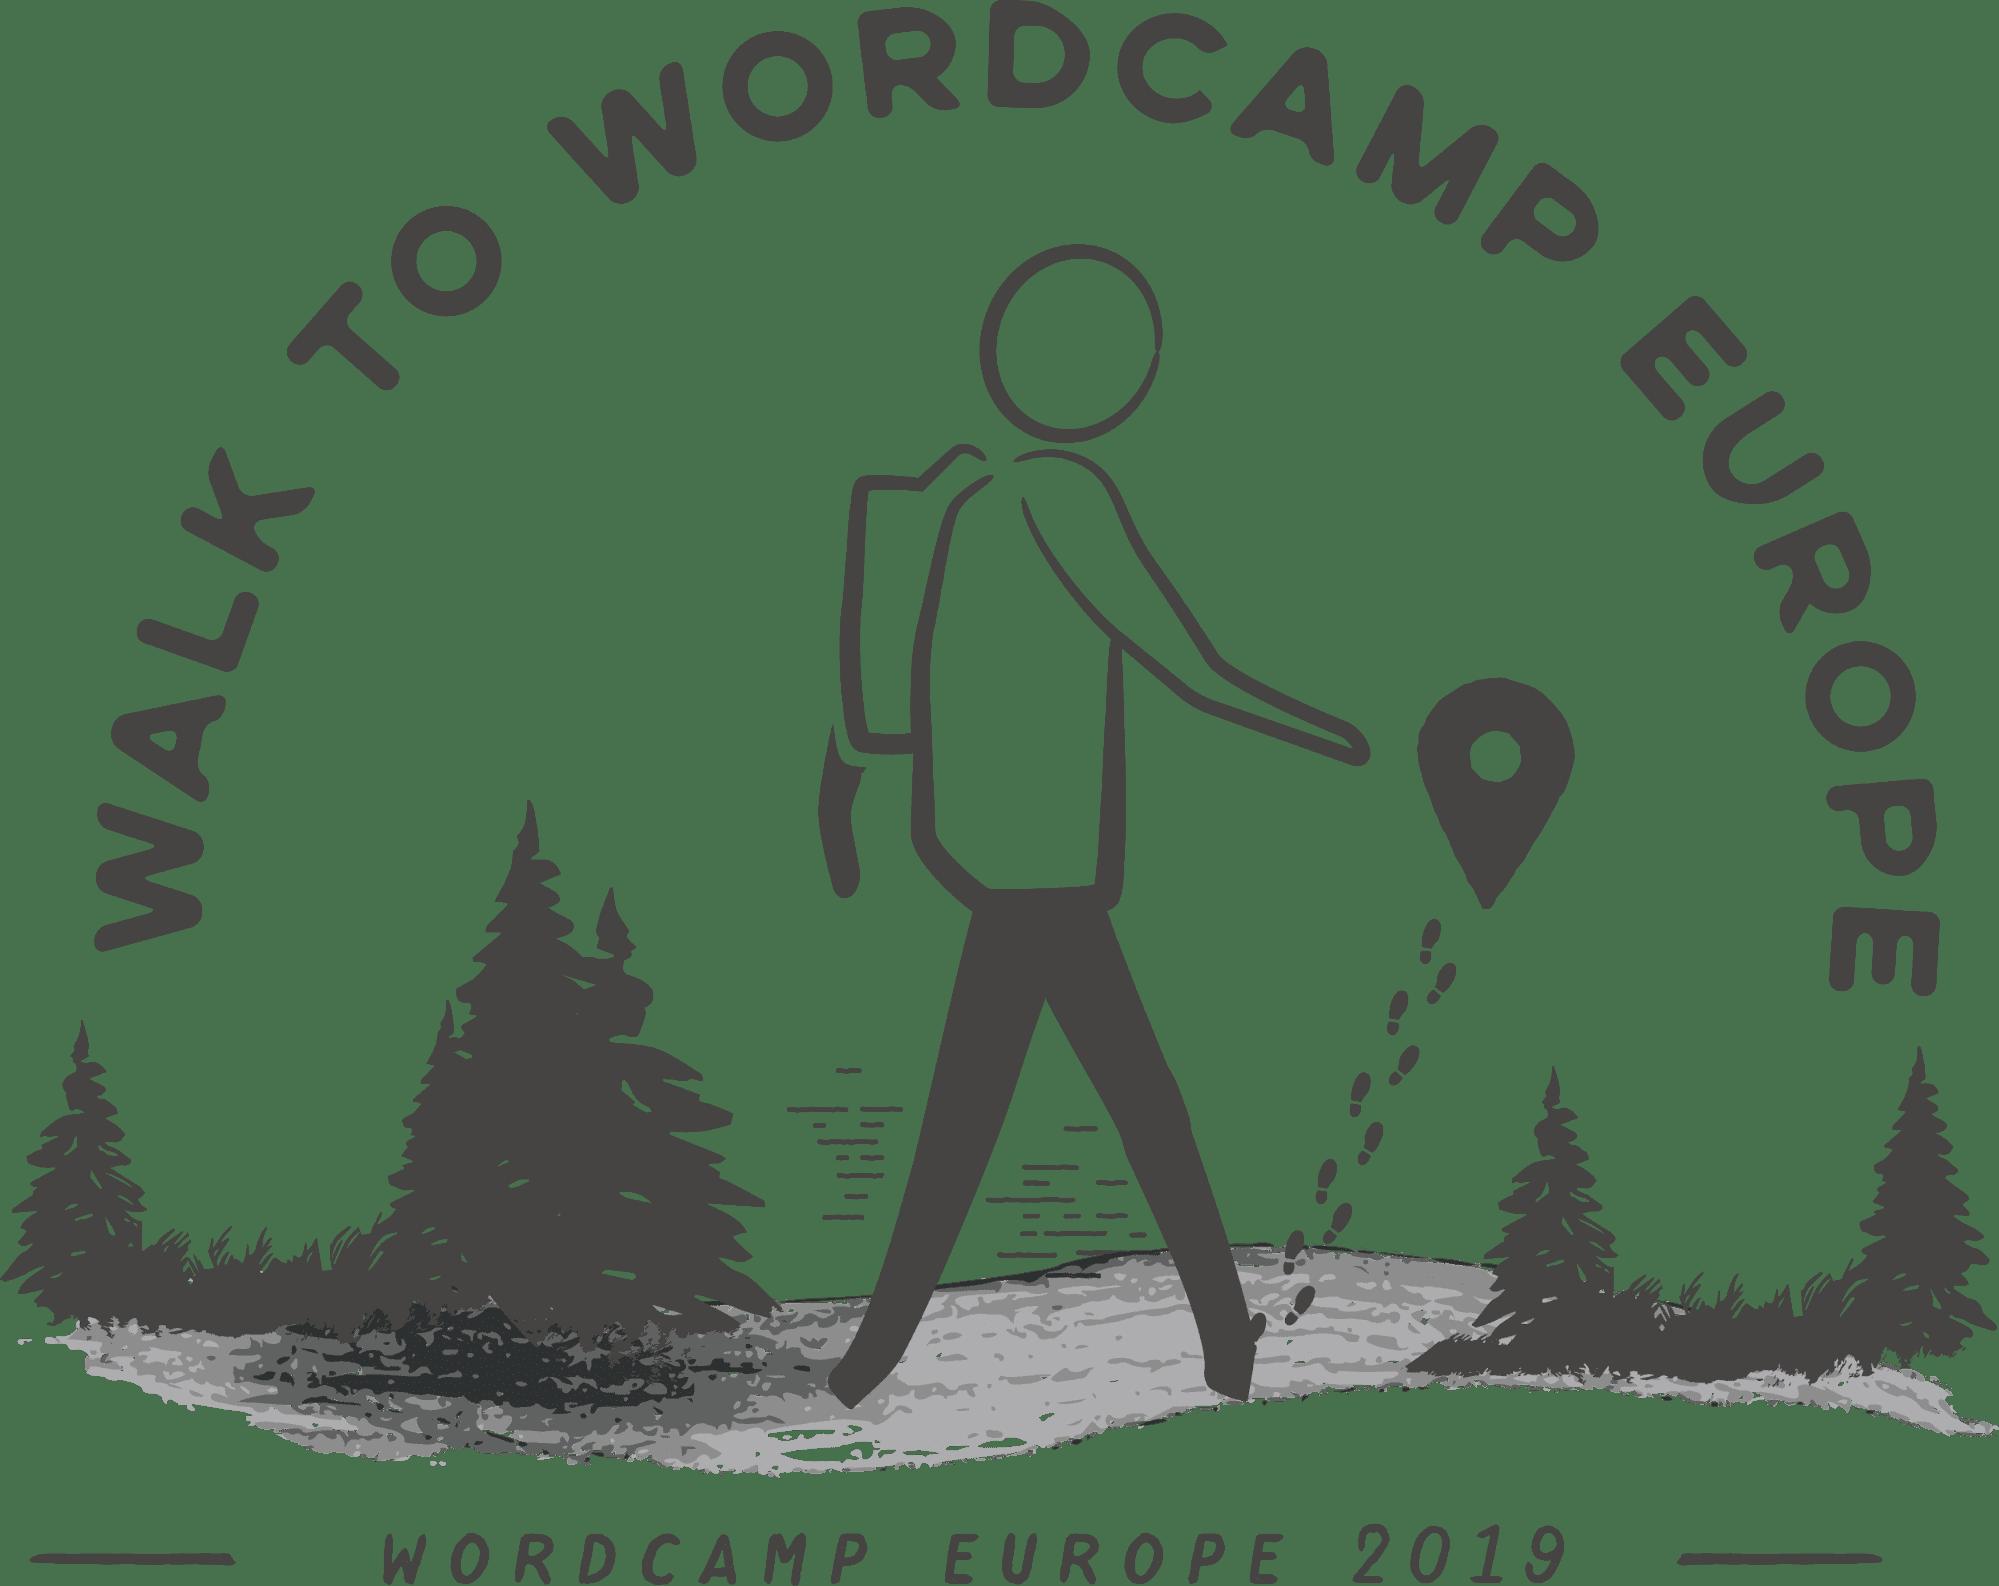 WordCamp Europeへのハイキング